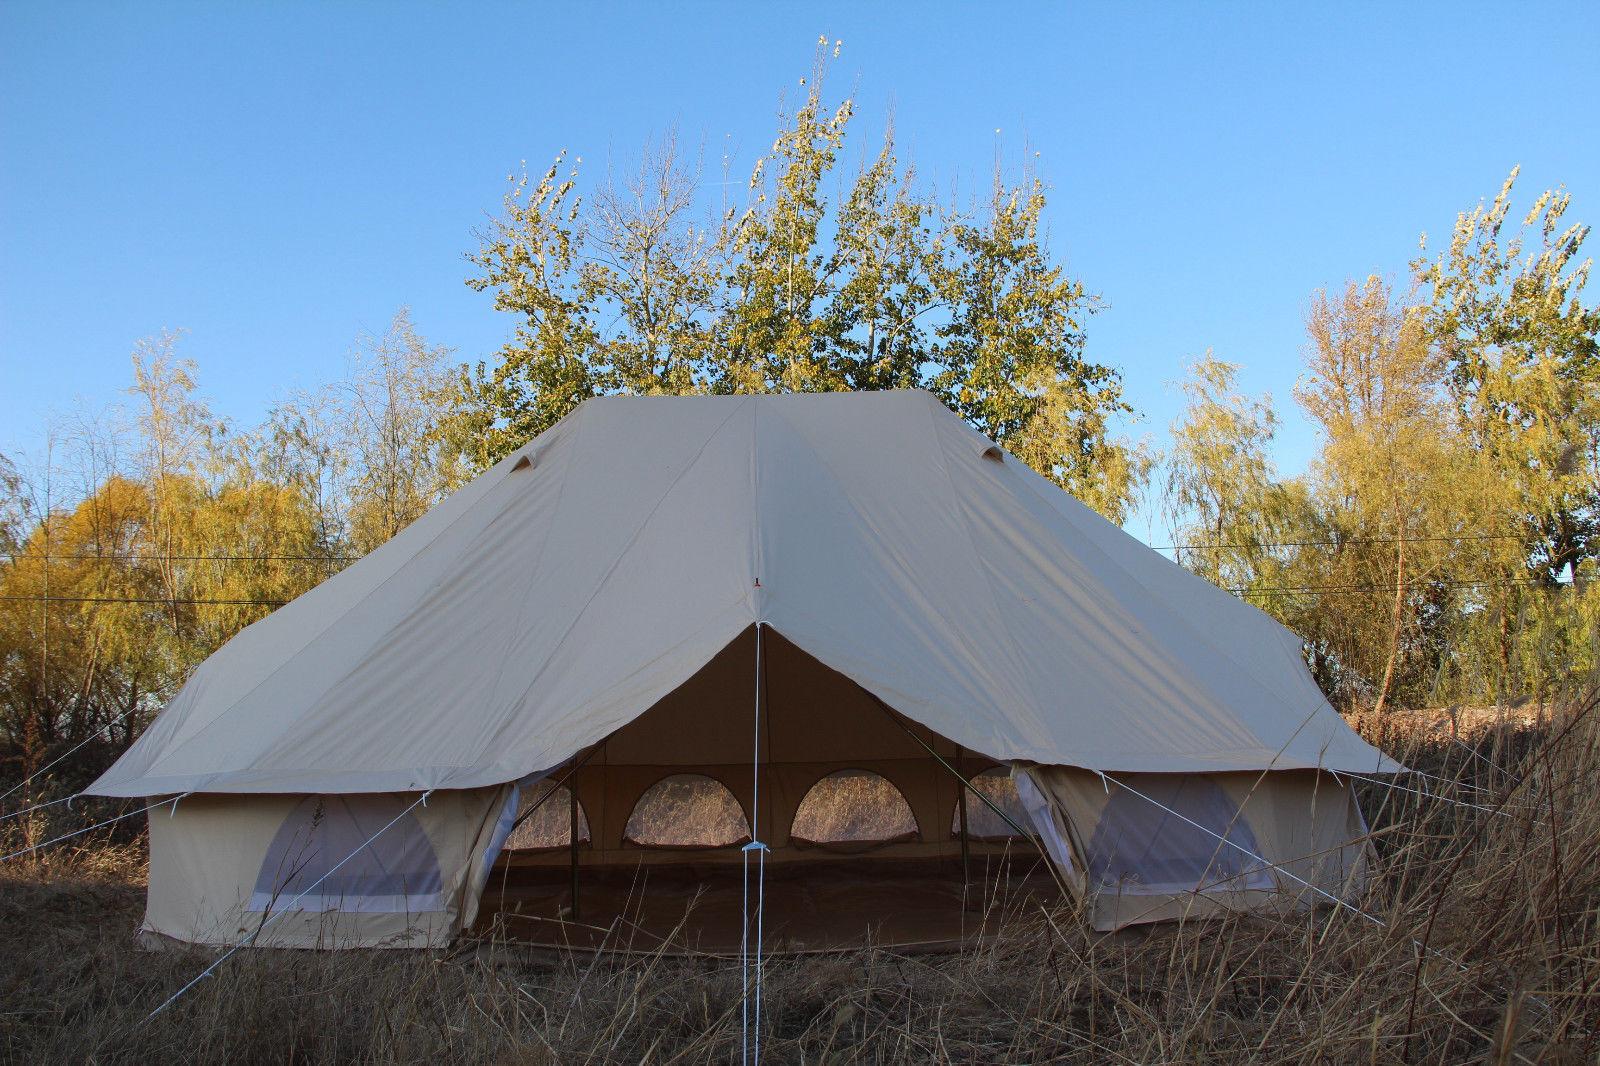 TOPSHOP 6M Emperor Twin Bell Tent Safari Tent Waterproof Hunting Camp Wall Tent